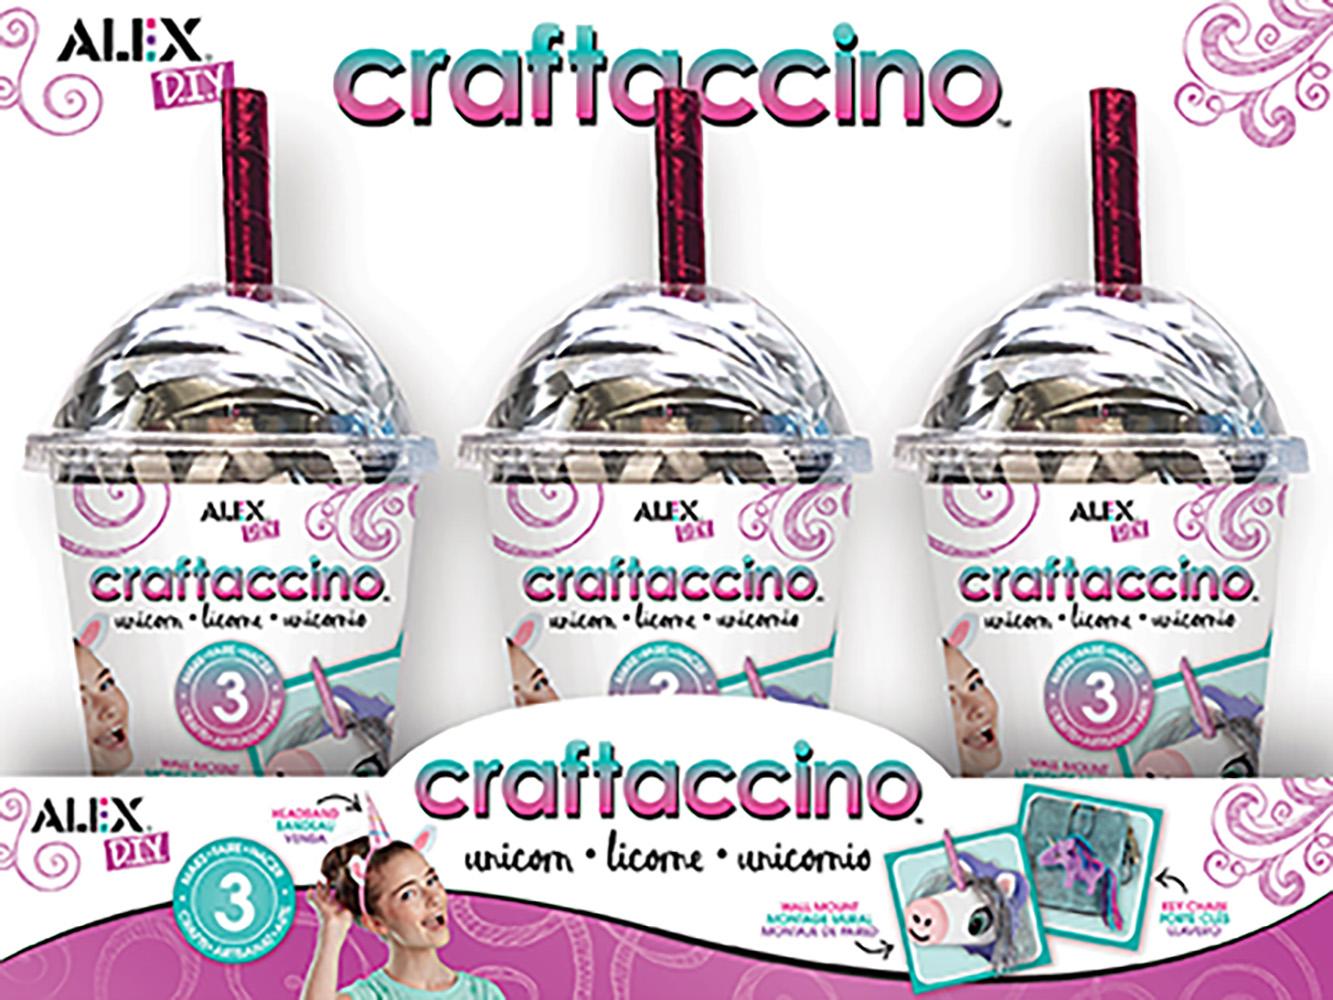 Alex - DIY Craftaccino Unicorn